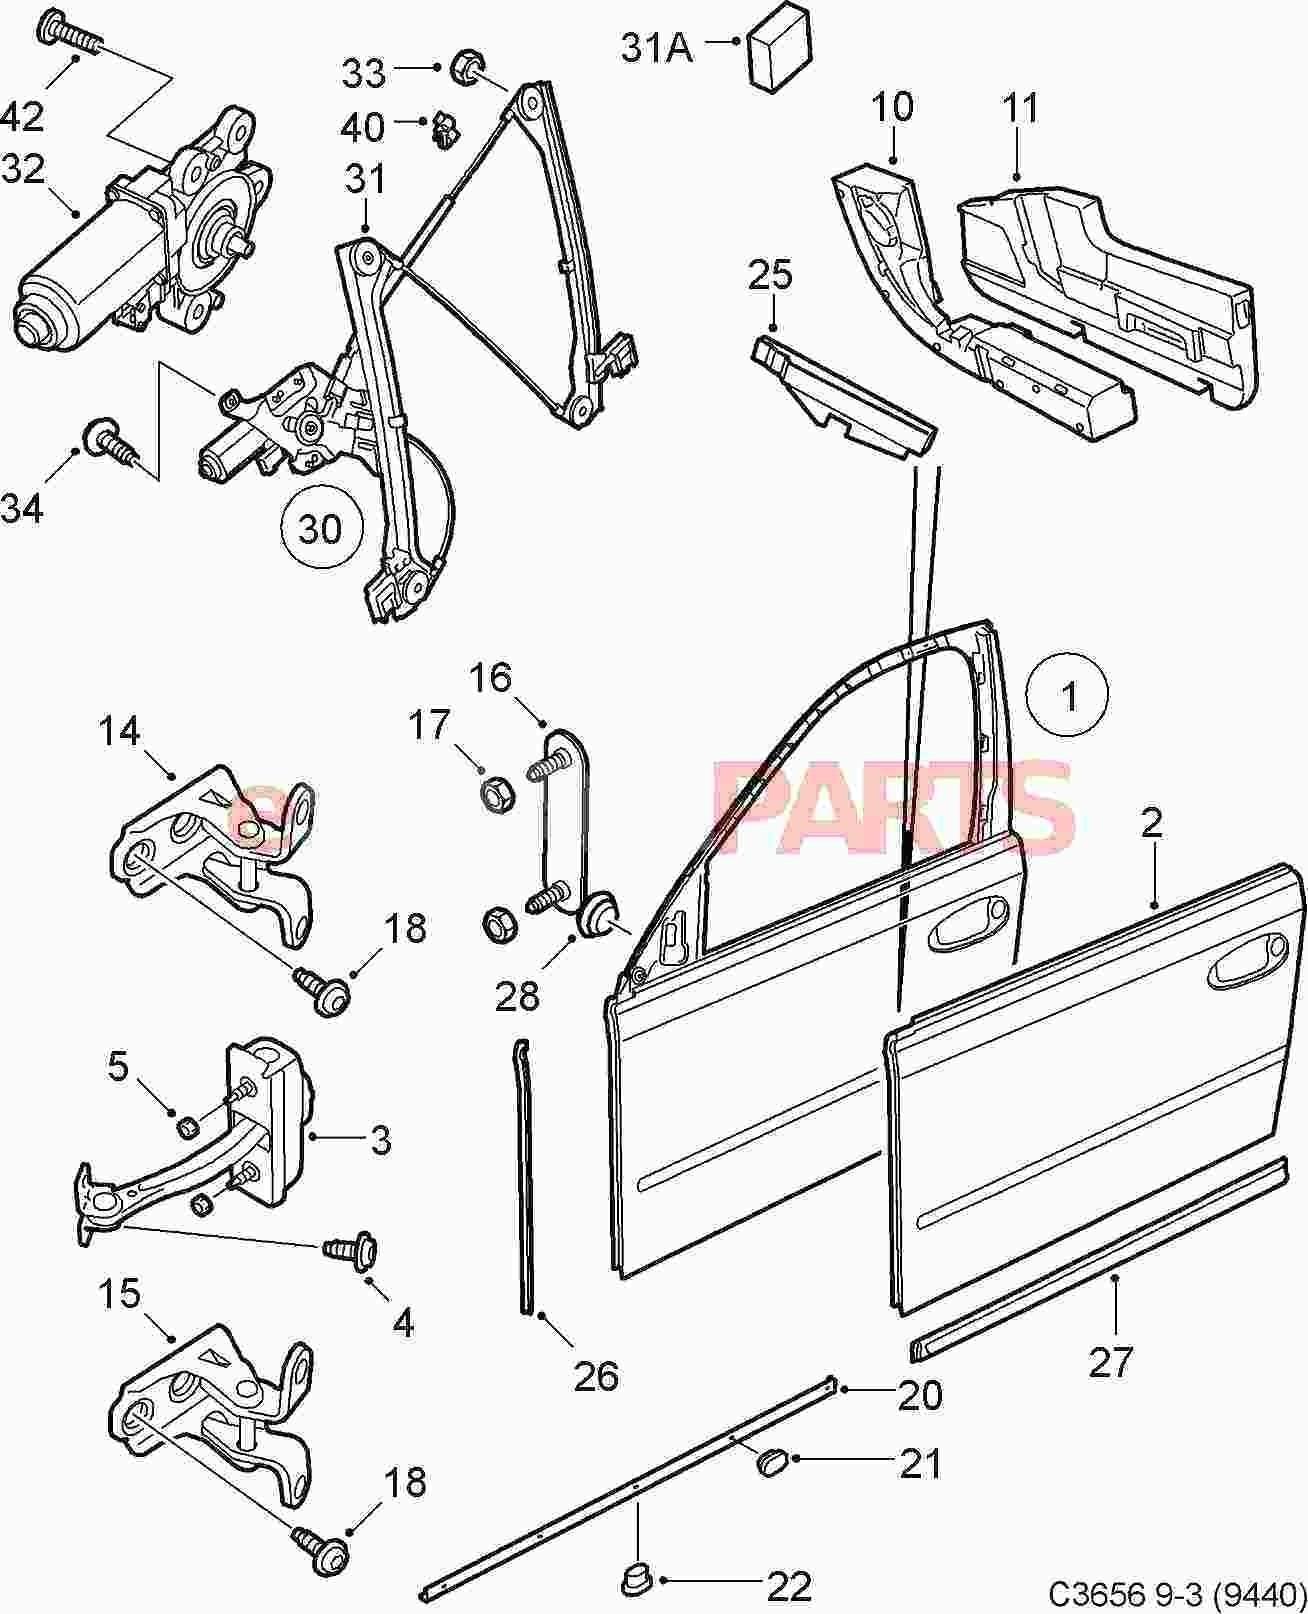 Car Undercarriage Parts Diagram Diagram Car Exterior Parts Car Diagram 24 Tremendous Car Of Car Undercarriage Parts Diagram